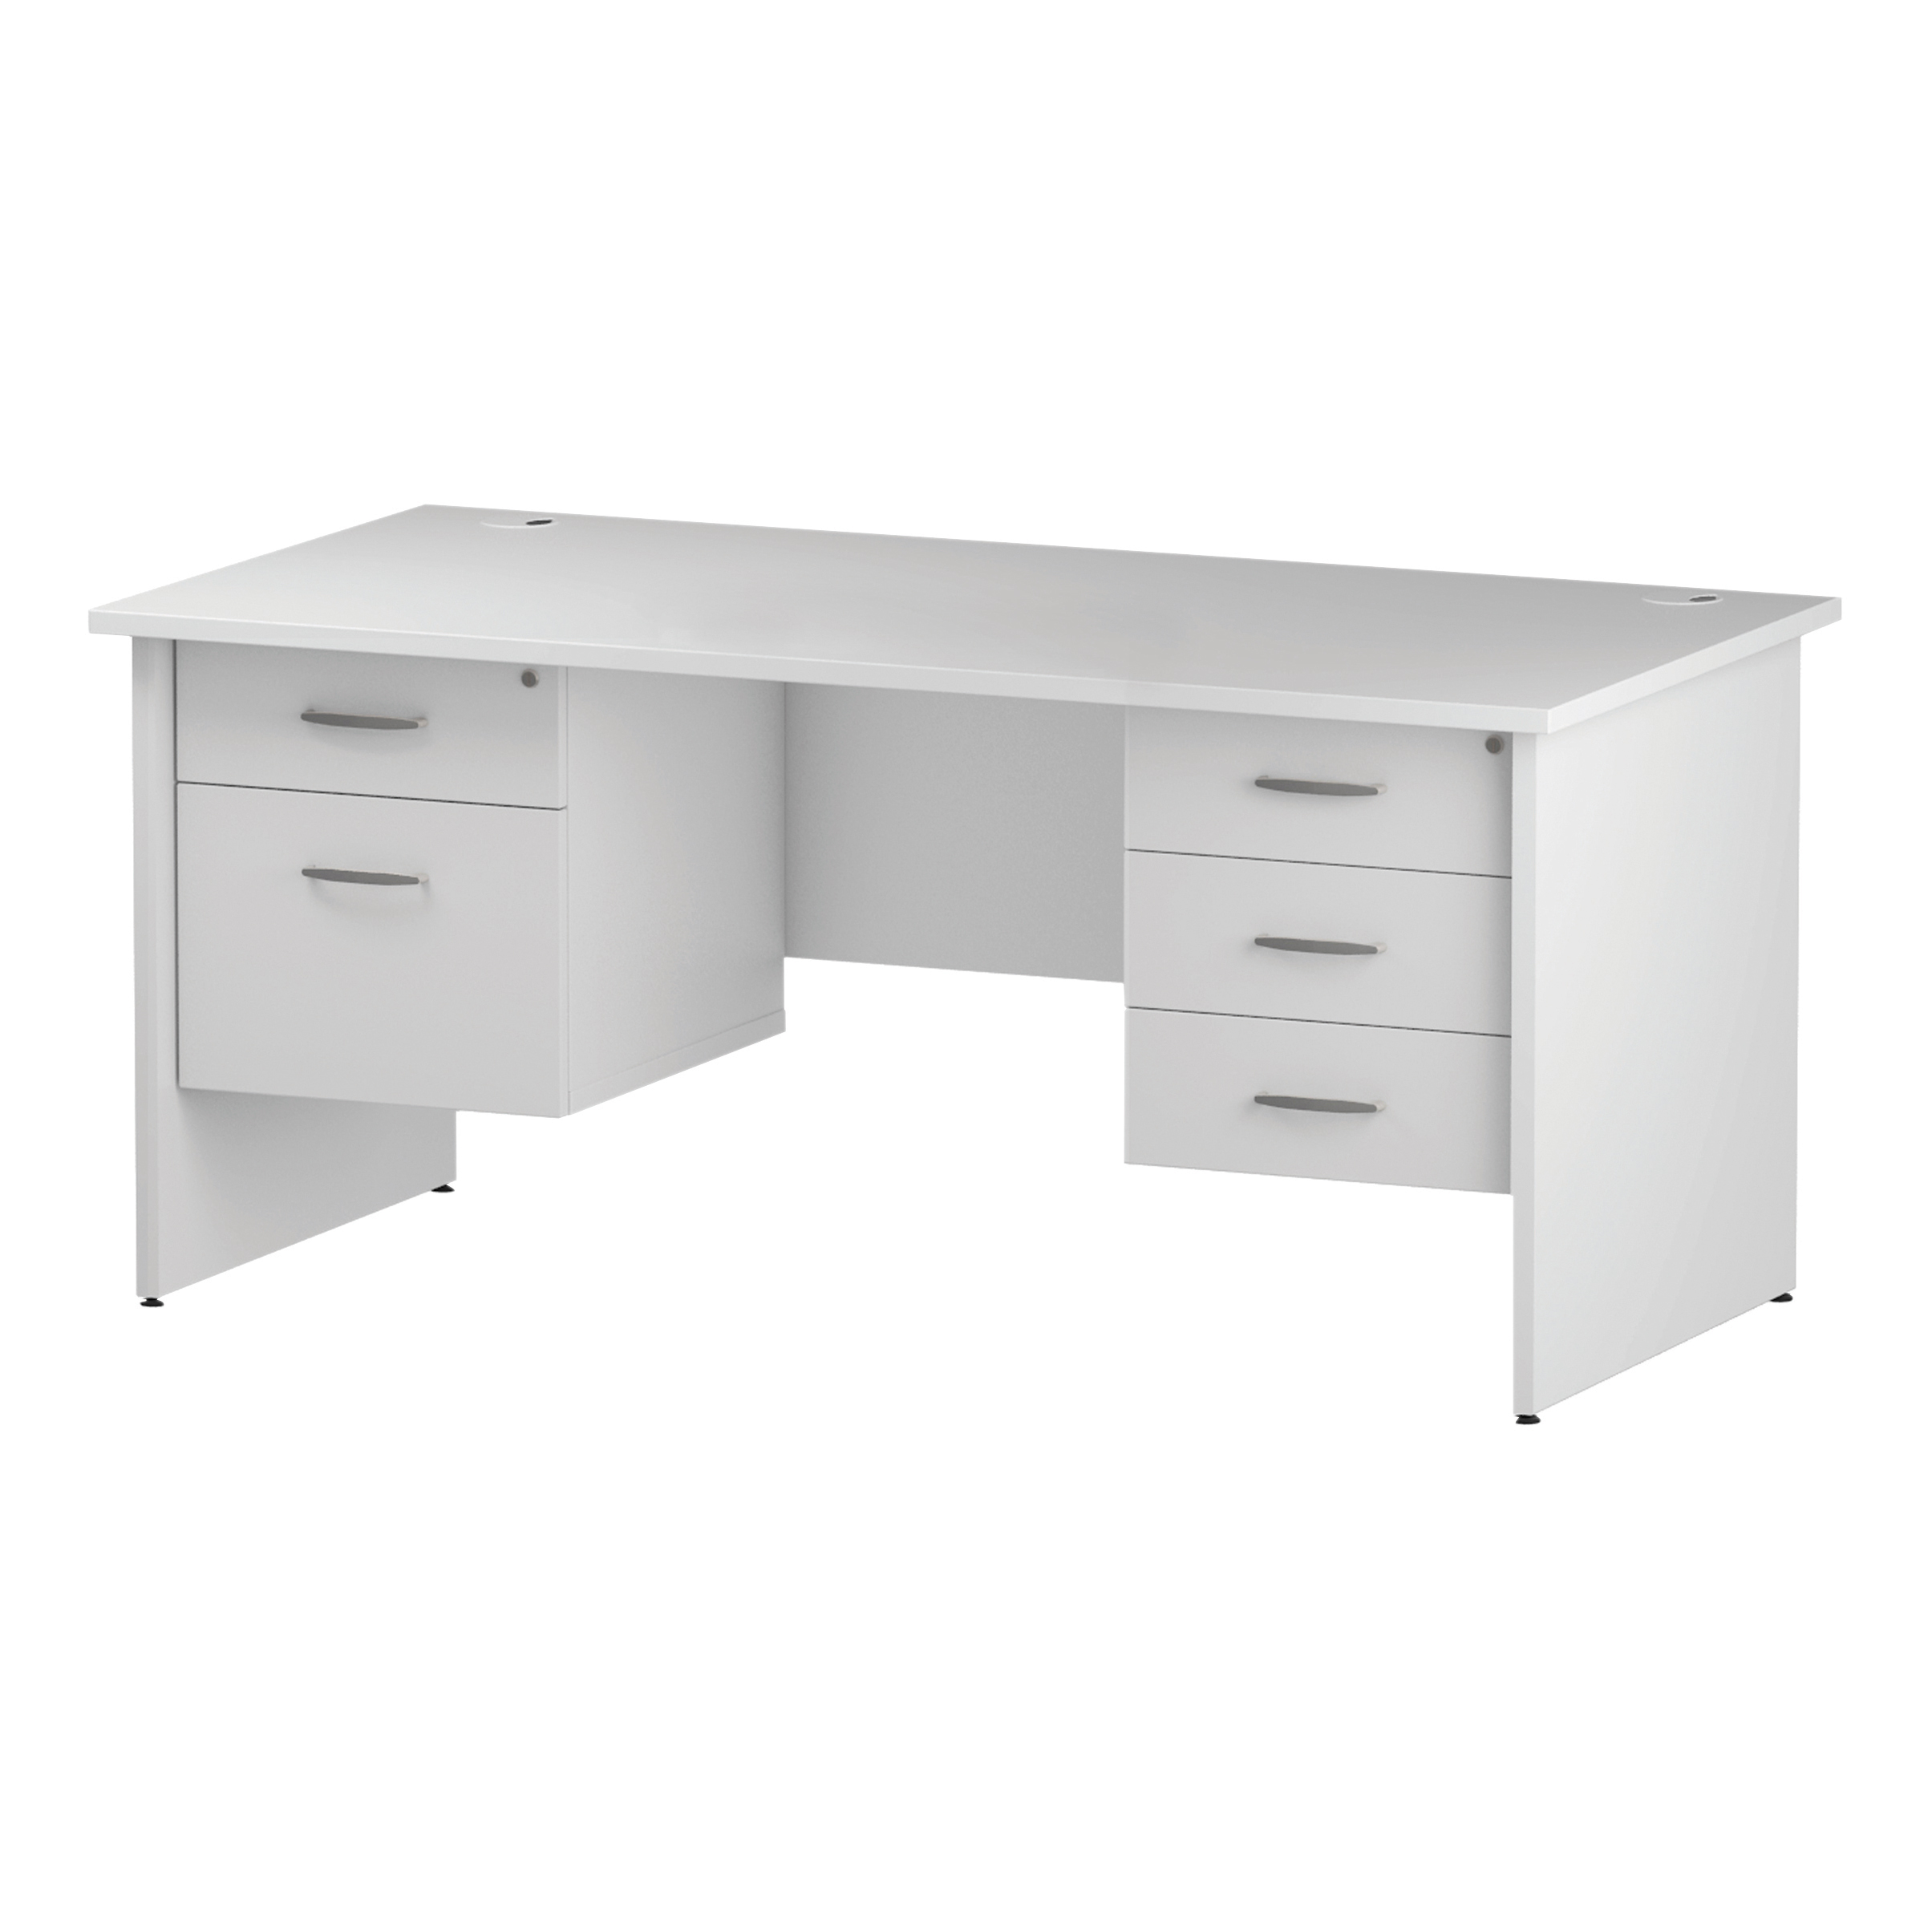 Trexus Rectangular Desk Panel End Leg 1600x800mm Double Fixed Pedestal 2&3 Drawers White Ref I002268